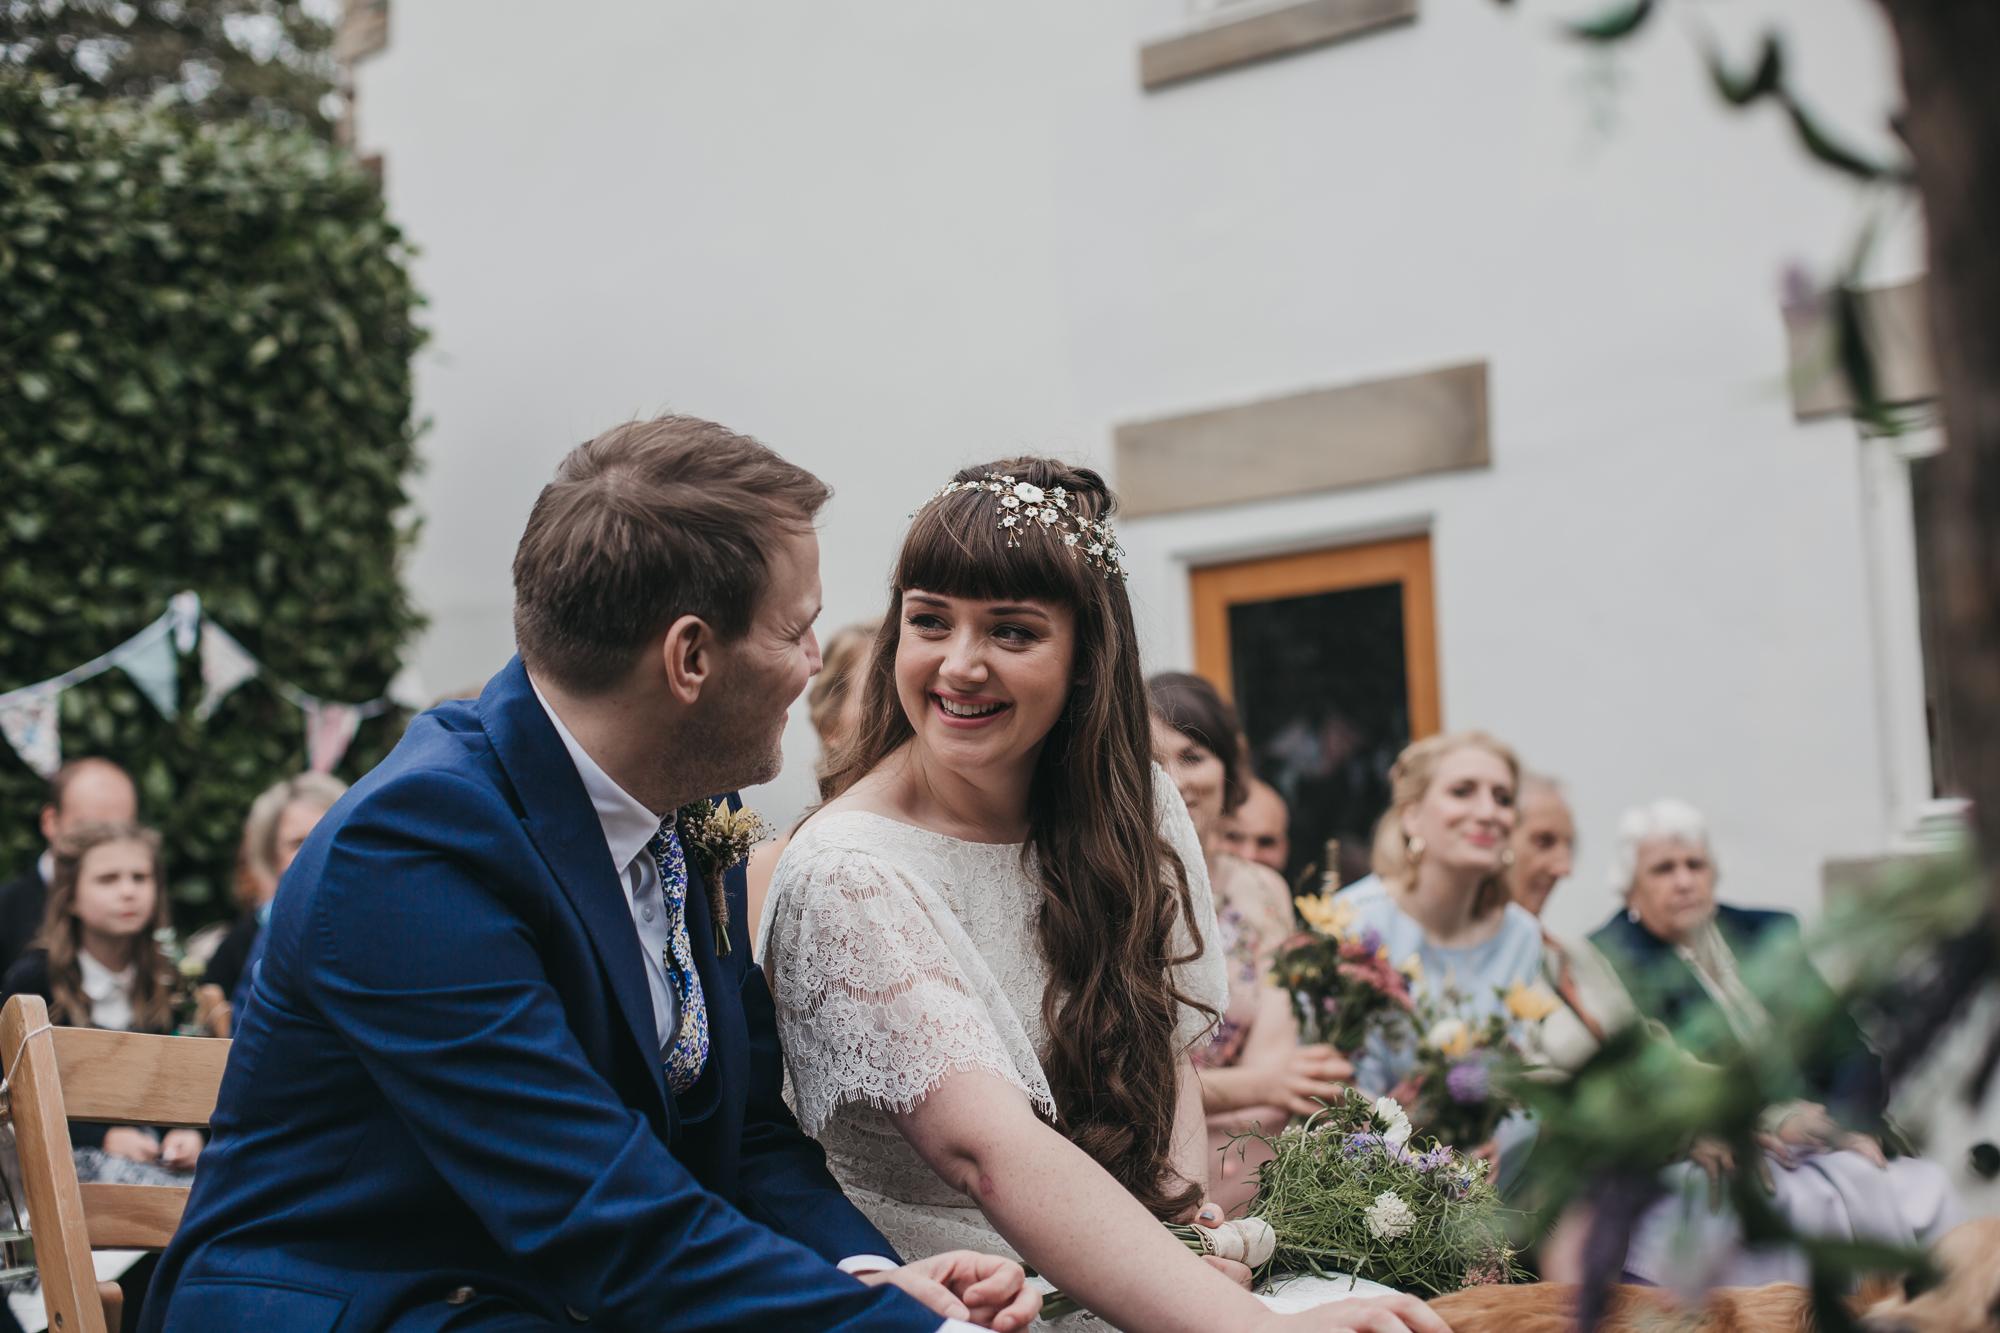 Kristy-Back-Garden-Outdoor-Wedding-Sheffield-Industrial-Warehouse-Wedding-Bohemian-Kate-Beaumont-Dahlia-Dress-14.jpg